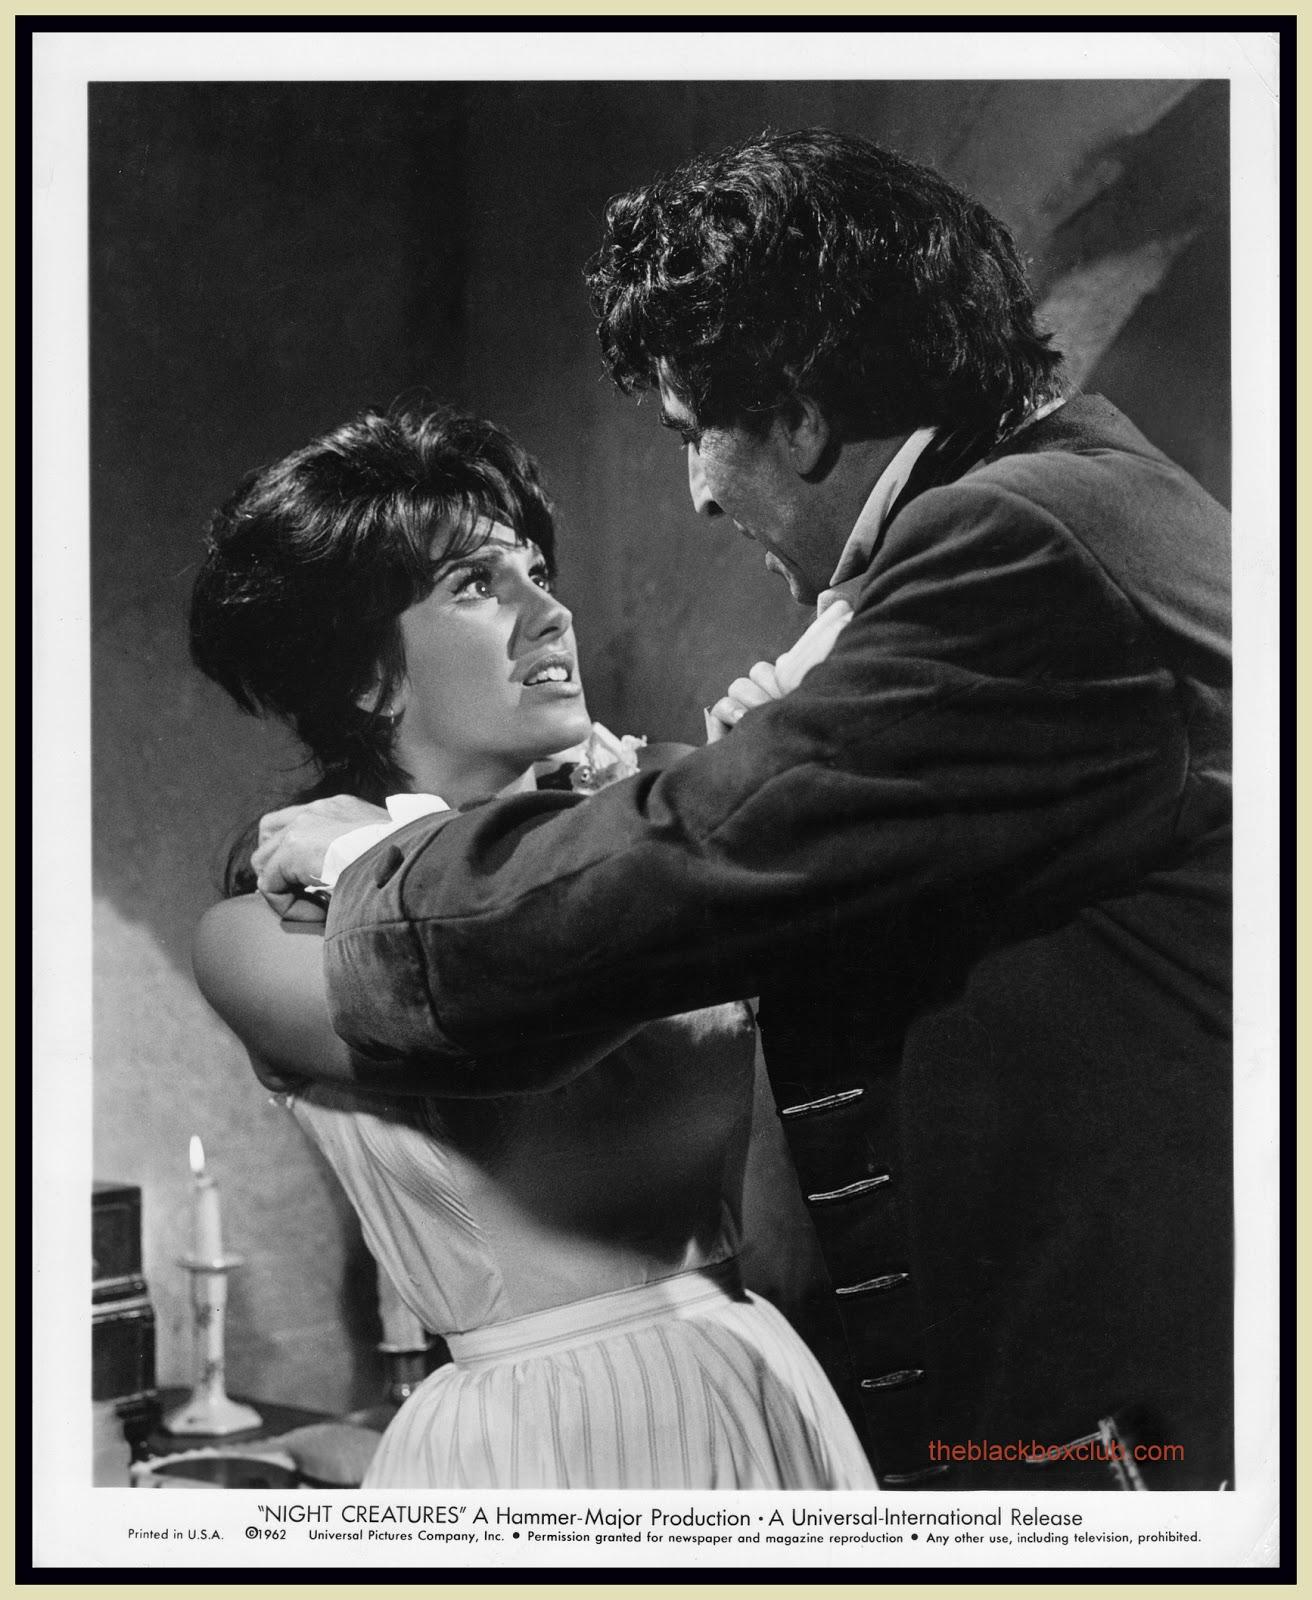 Saman Ansari,Mary Anderson (actress, born 1897) XXX image Ronald Pickup (born 1940),Sarah Michelle Gellar